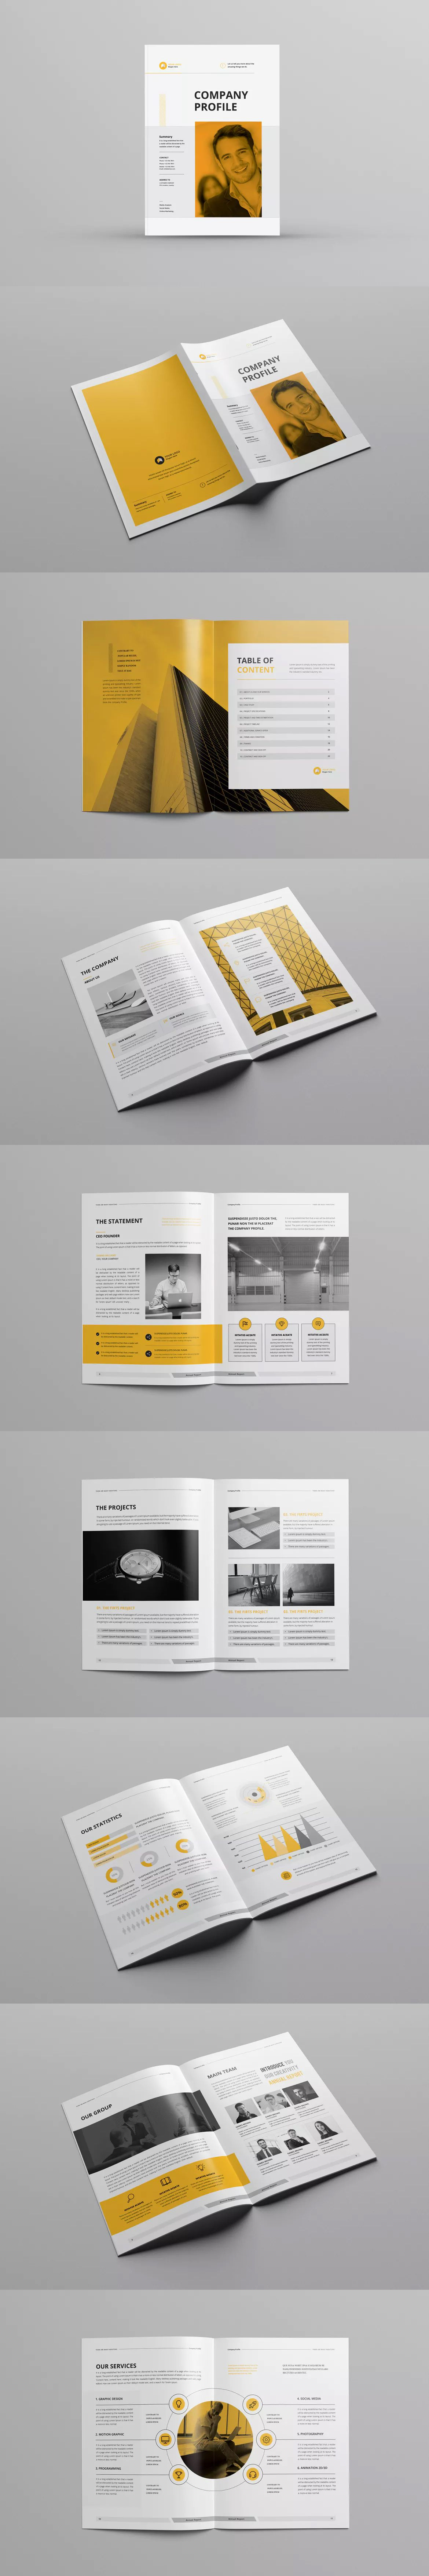 Company Profile Template InDesign INDD - A4   Company Profile ...